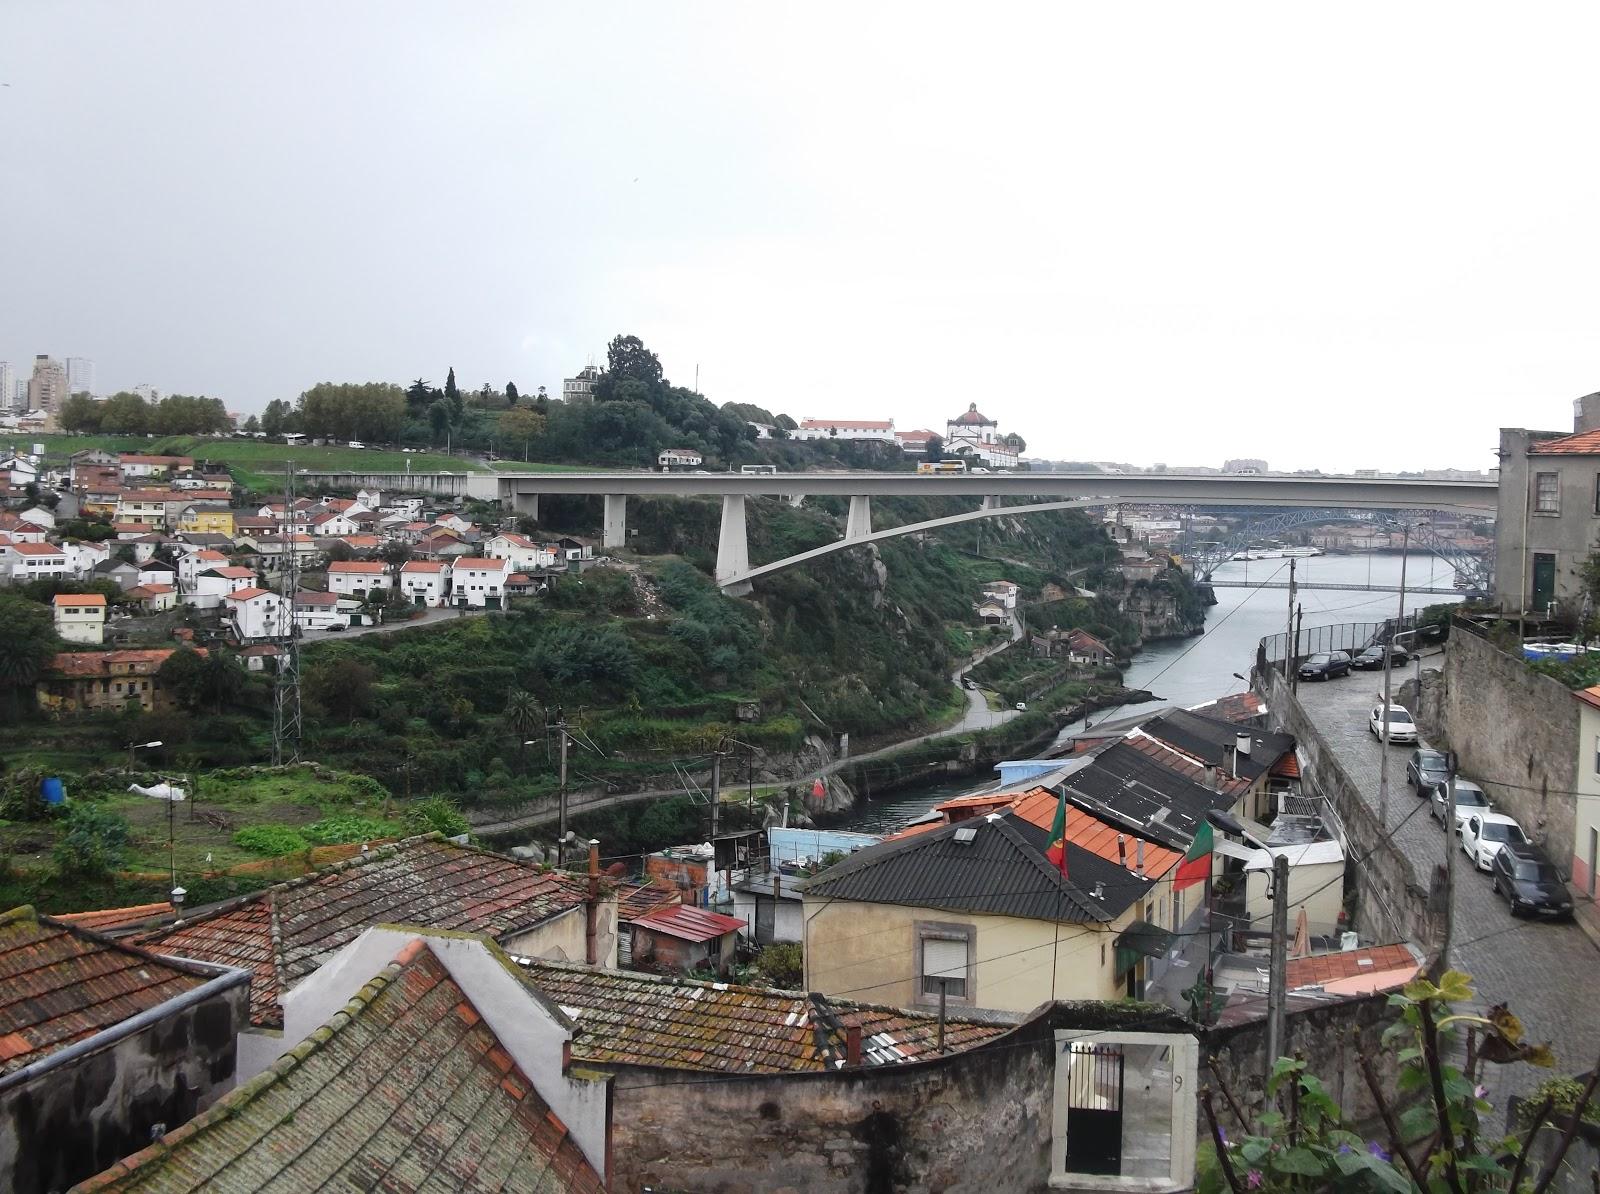 harding england exploring porto portugal. Black Bedroom Furniture Sets. Home Design Ideas